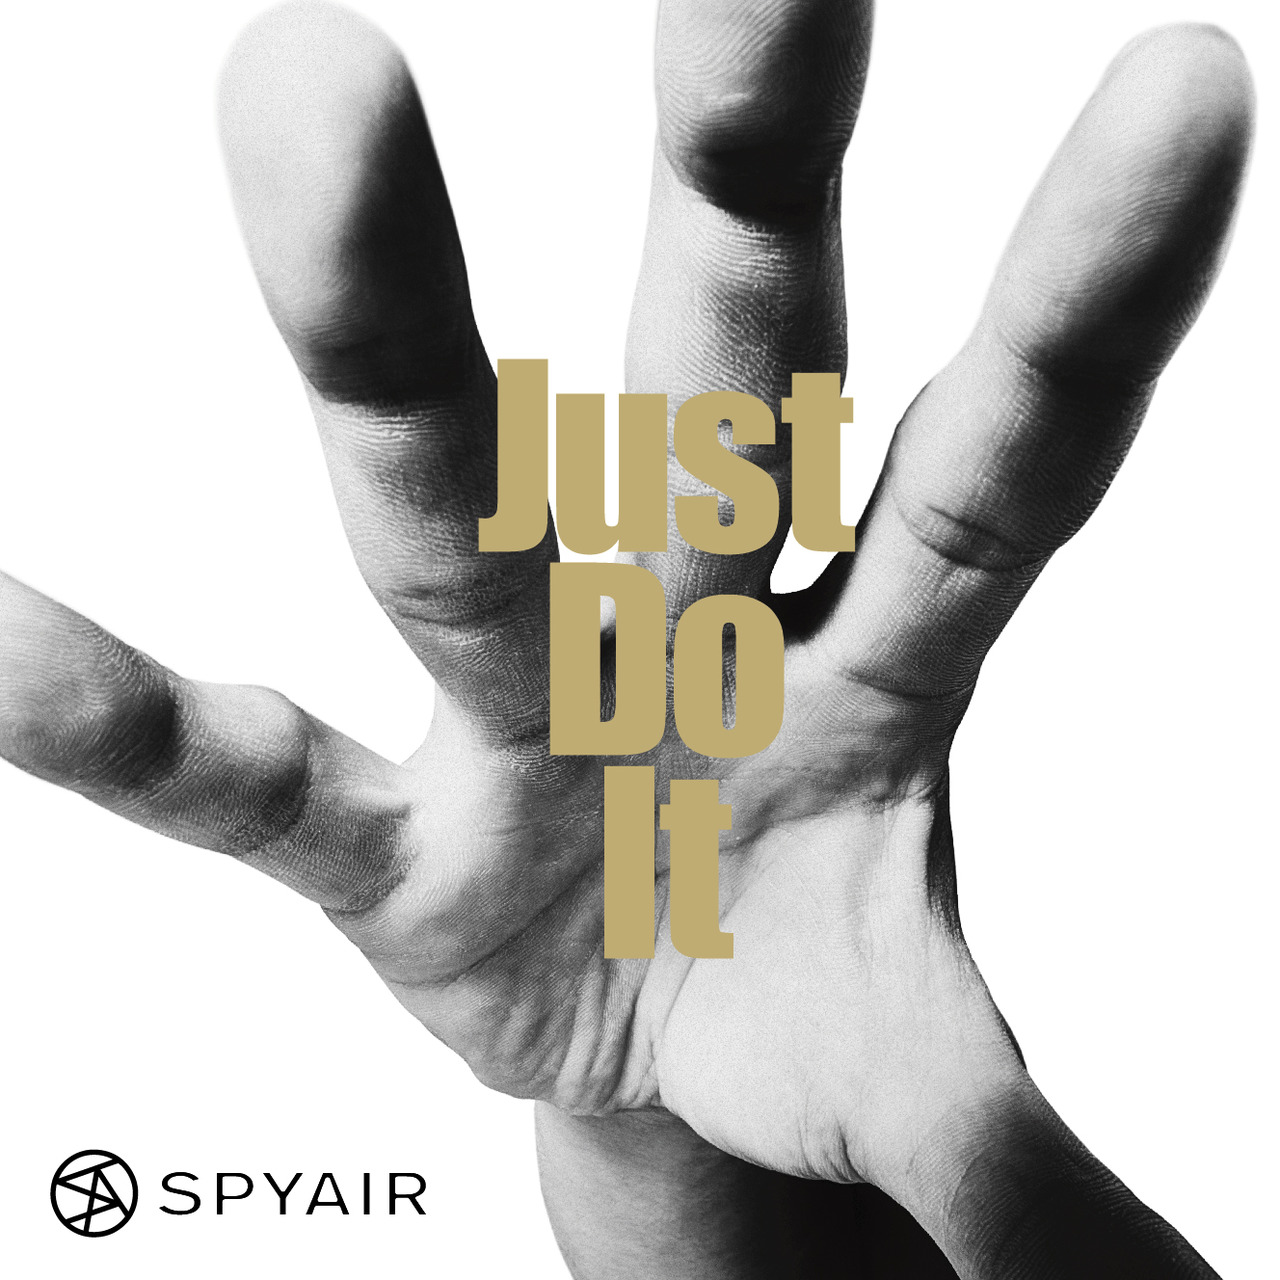 spyair just do it limited edition b